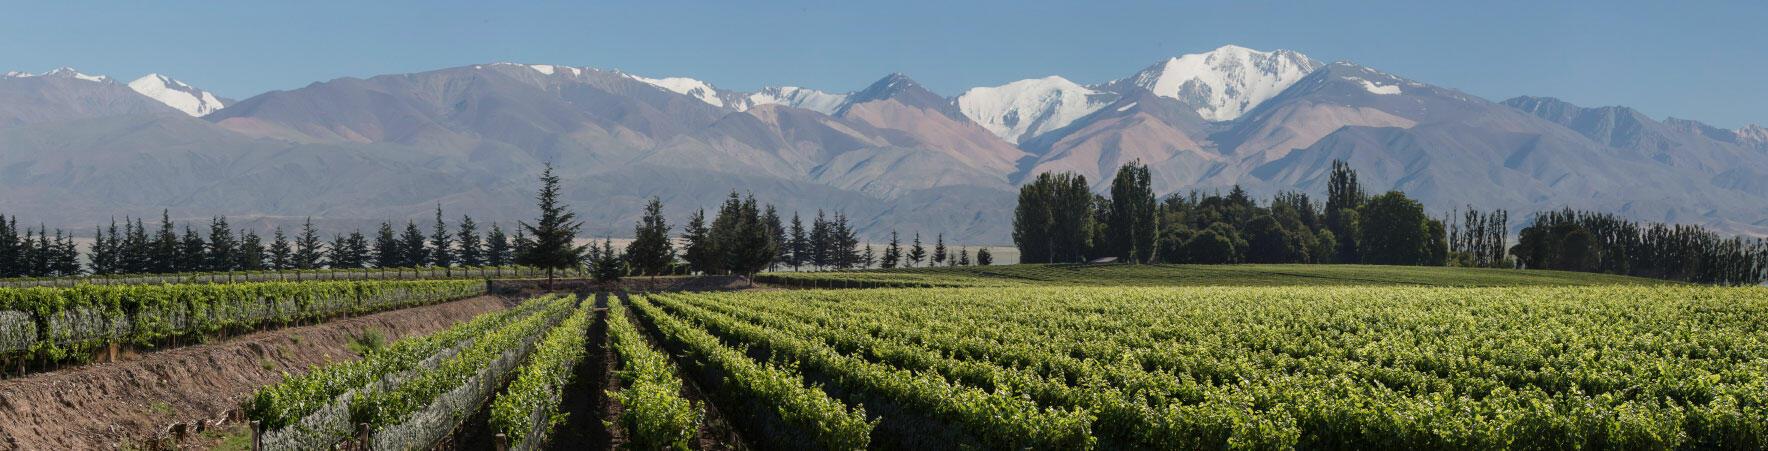 Falasco Wines Cover Image